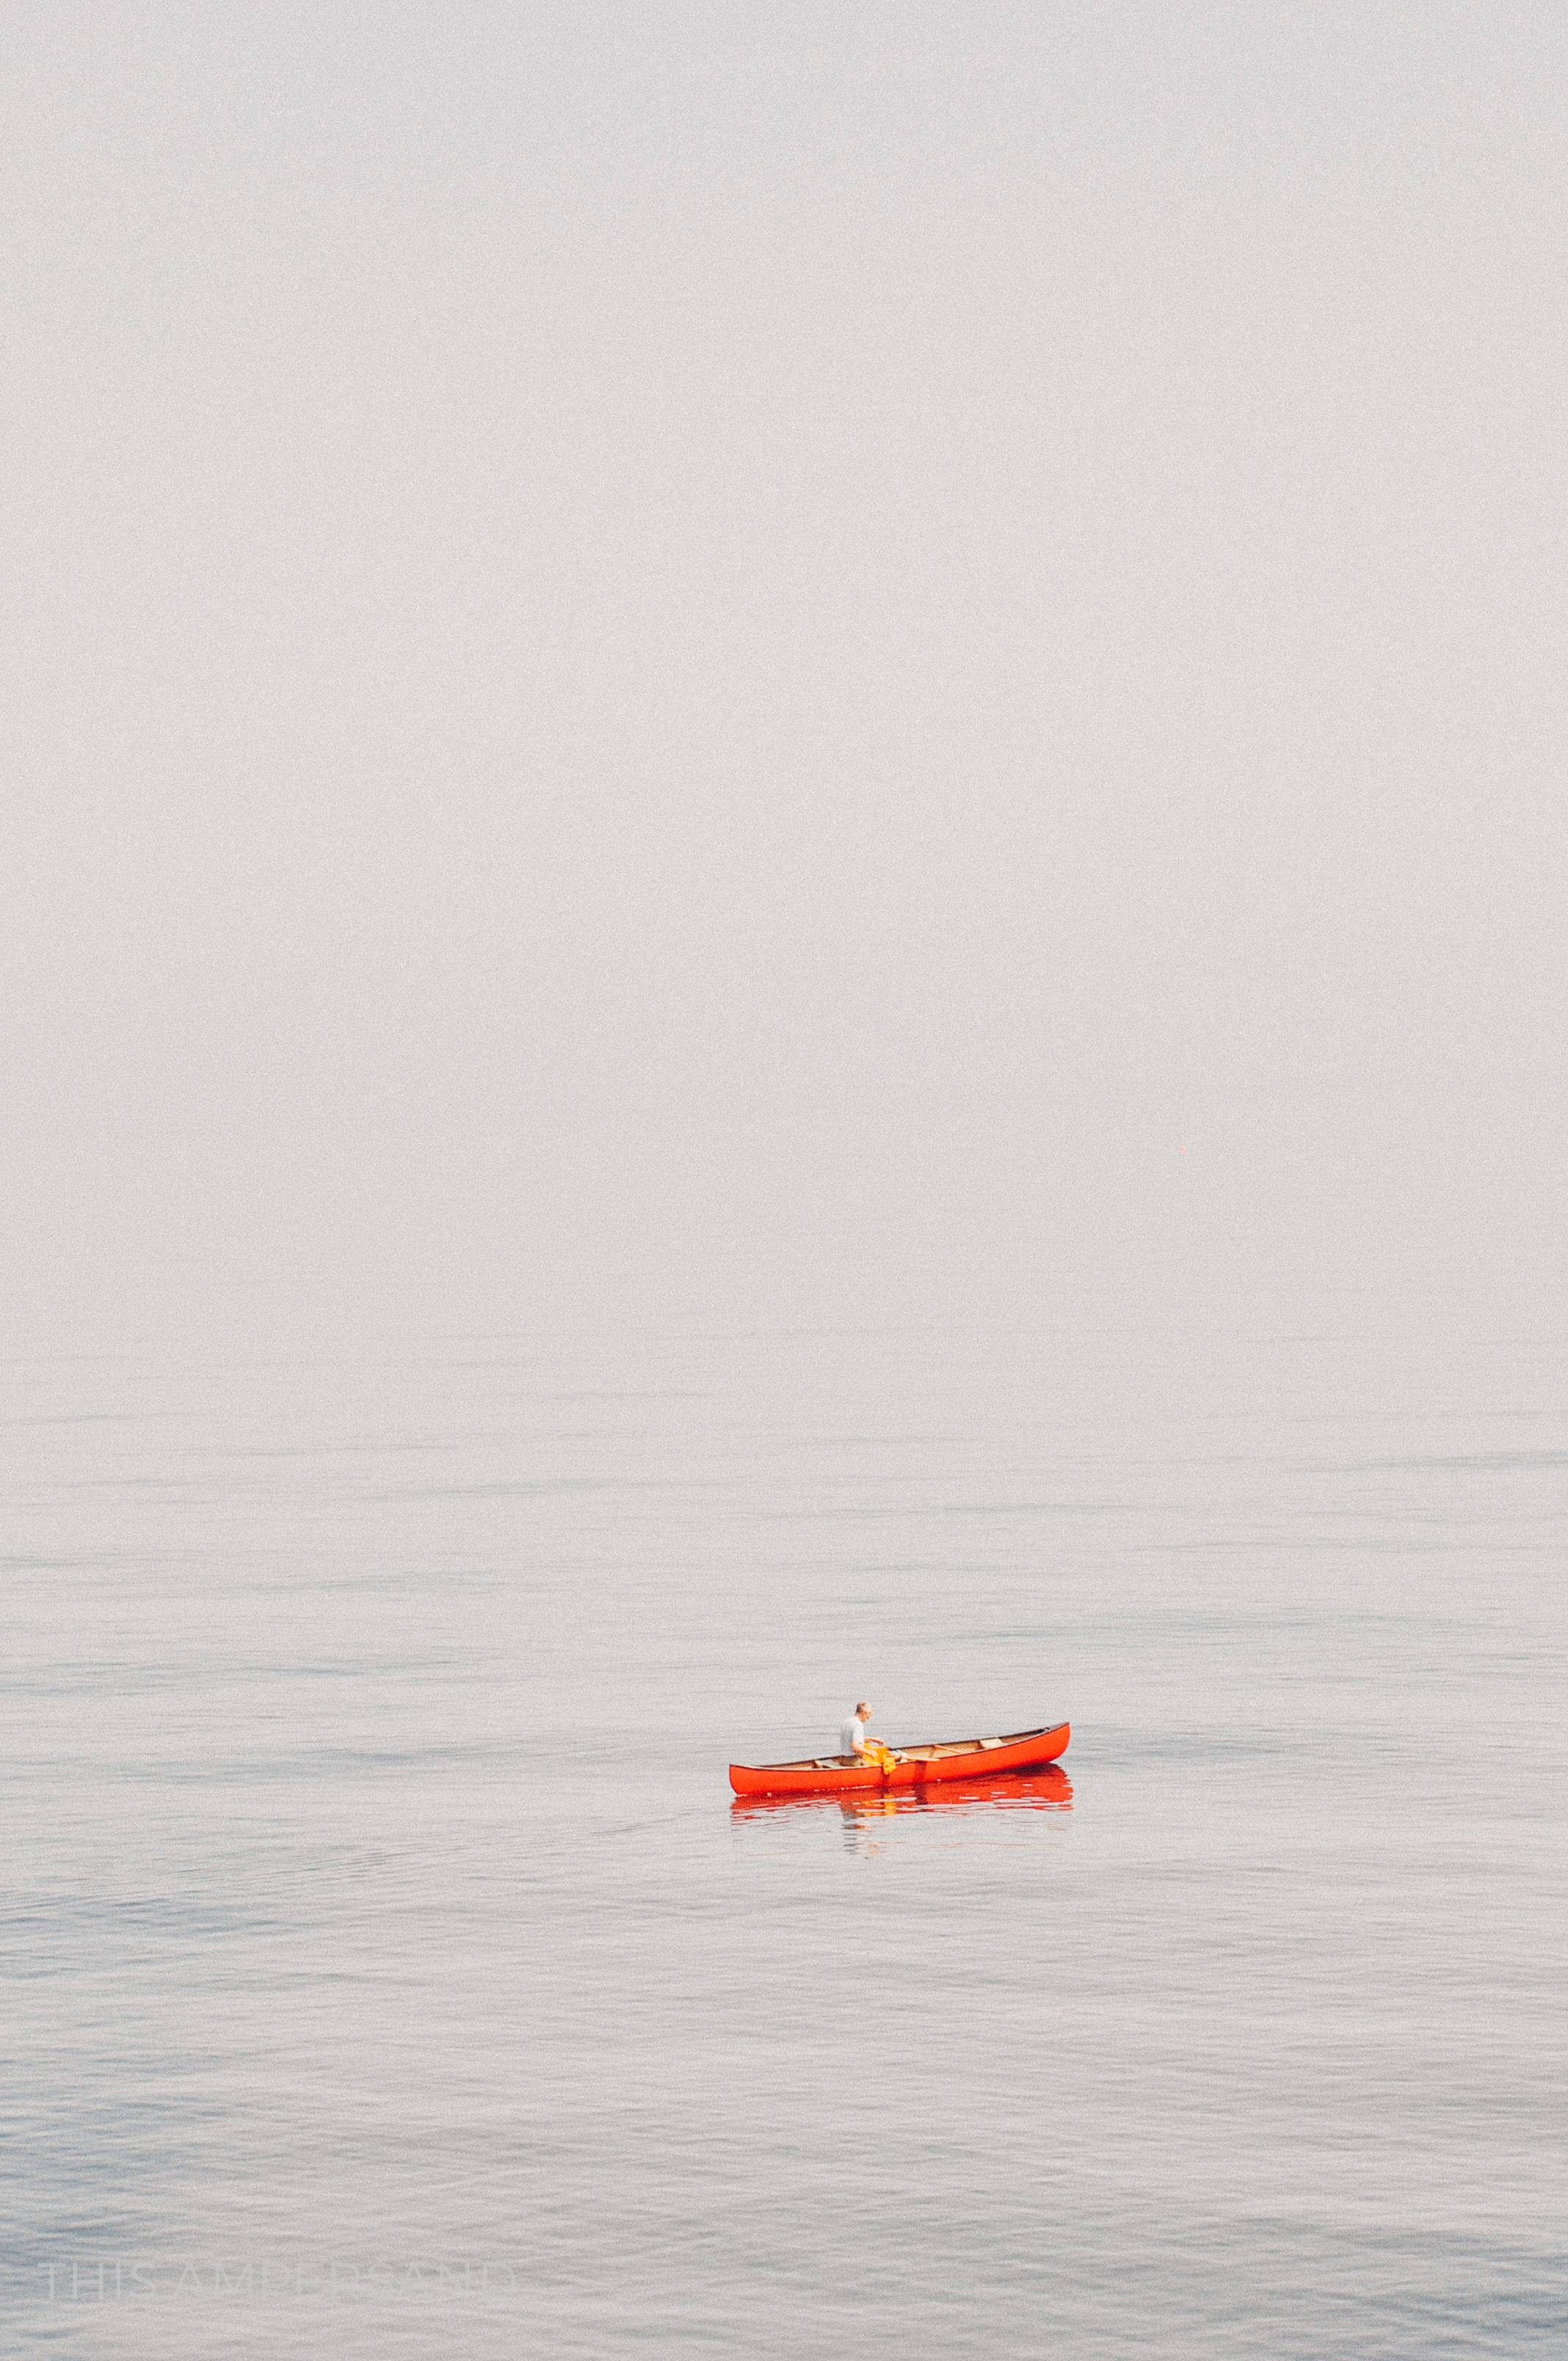 Northern Ireland Boat